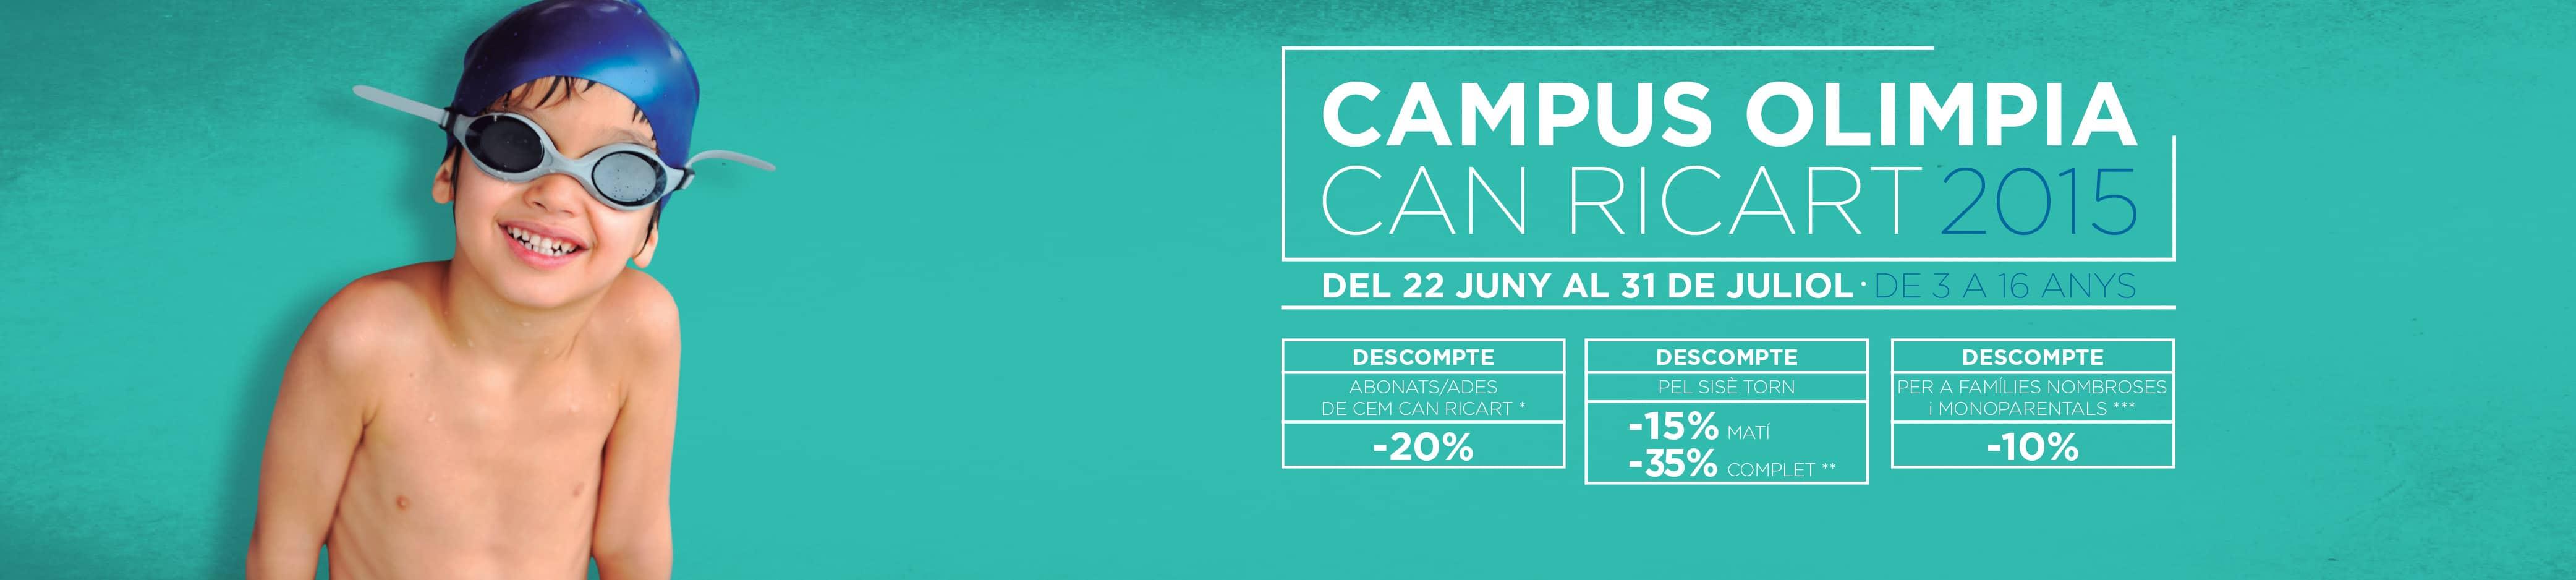 CAMPUS OLÍMPIA banner